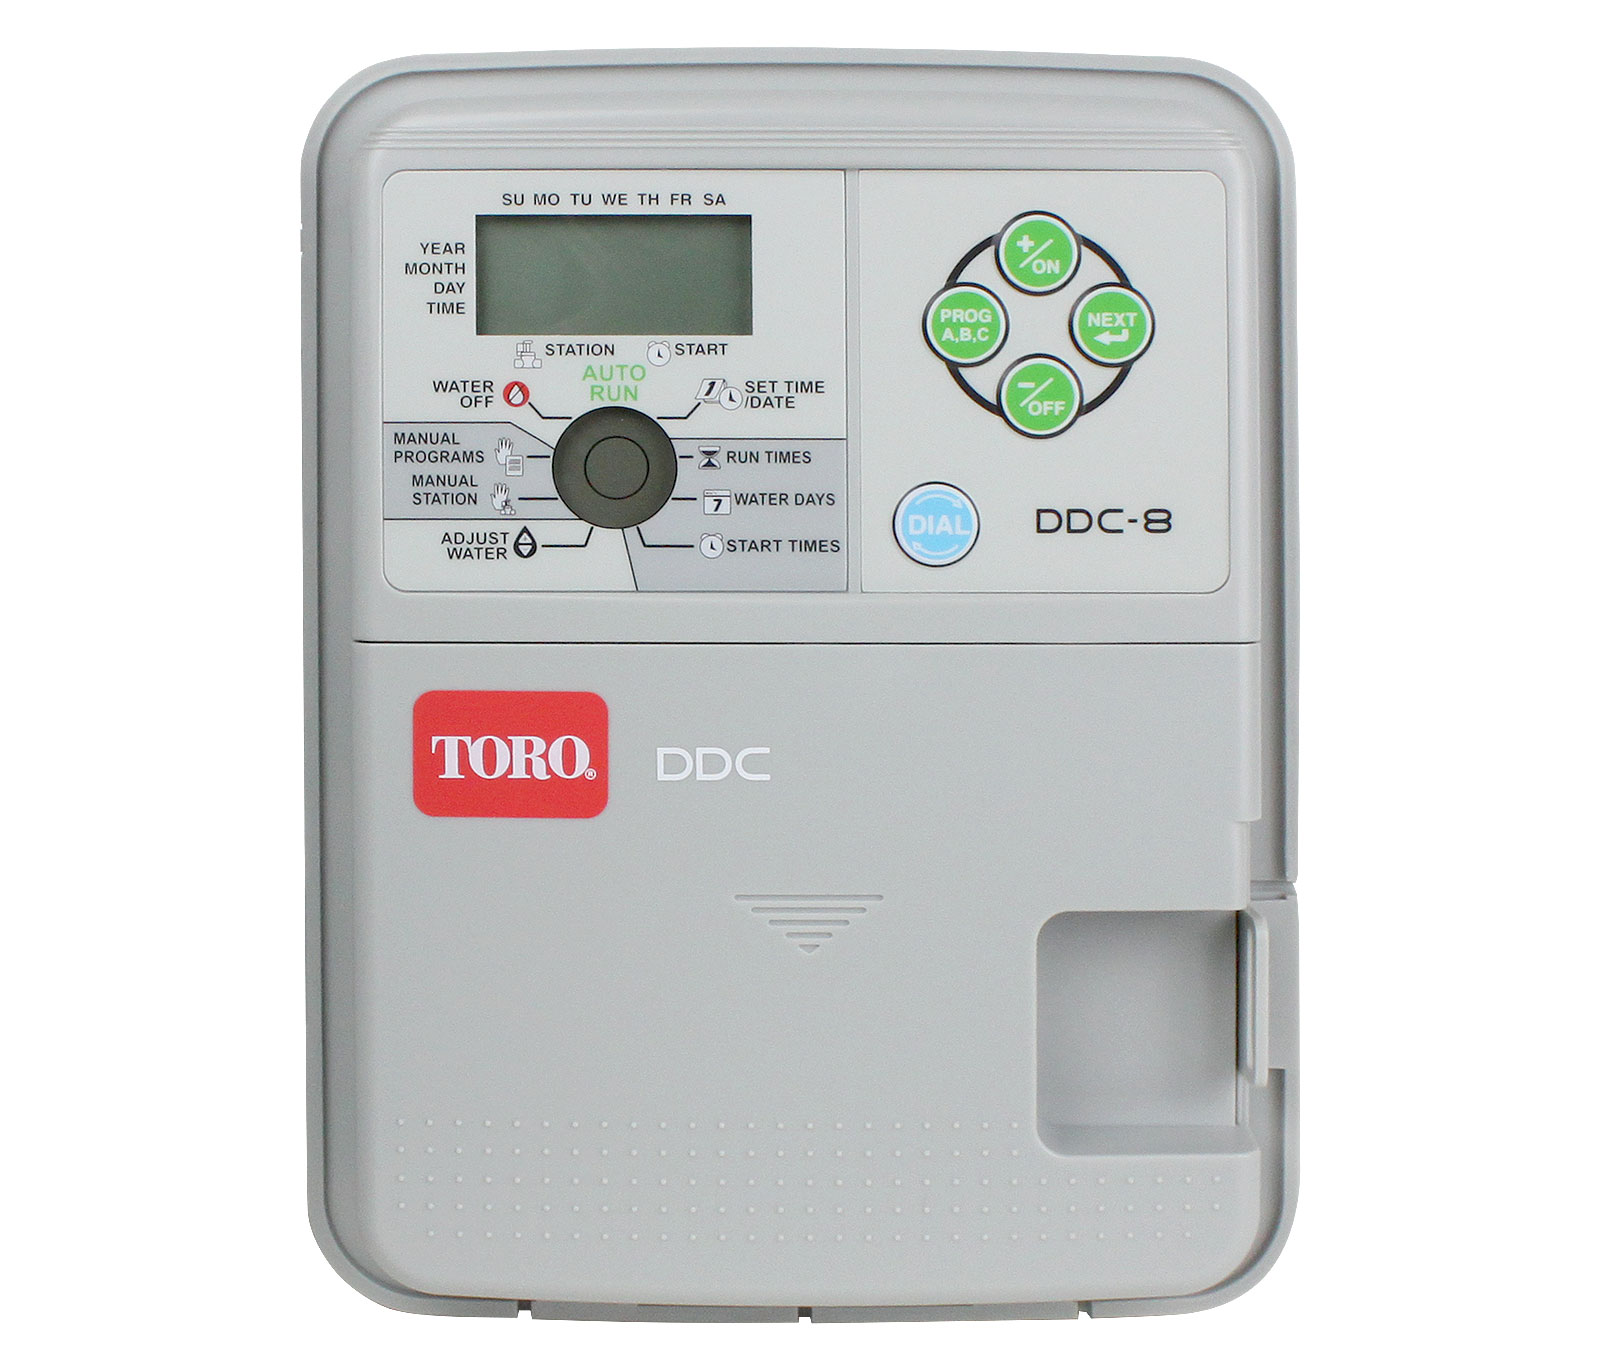 DDC 53808 main.ashx?mw=700&mh=599&hash=C73DE7A7934C22454F374E5AE0660574EE64DF24 toro irrigation timers, sprinkler timers, irrigation controllers toro tmc-212 wiring diagram at virtualis.co